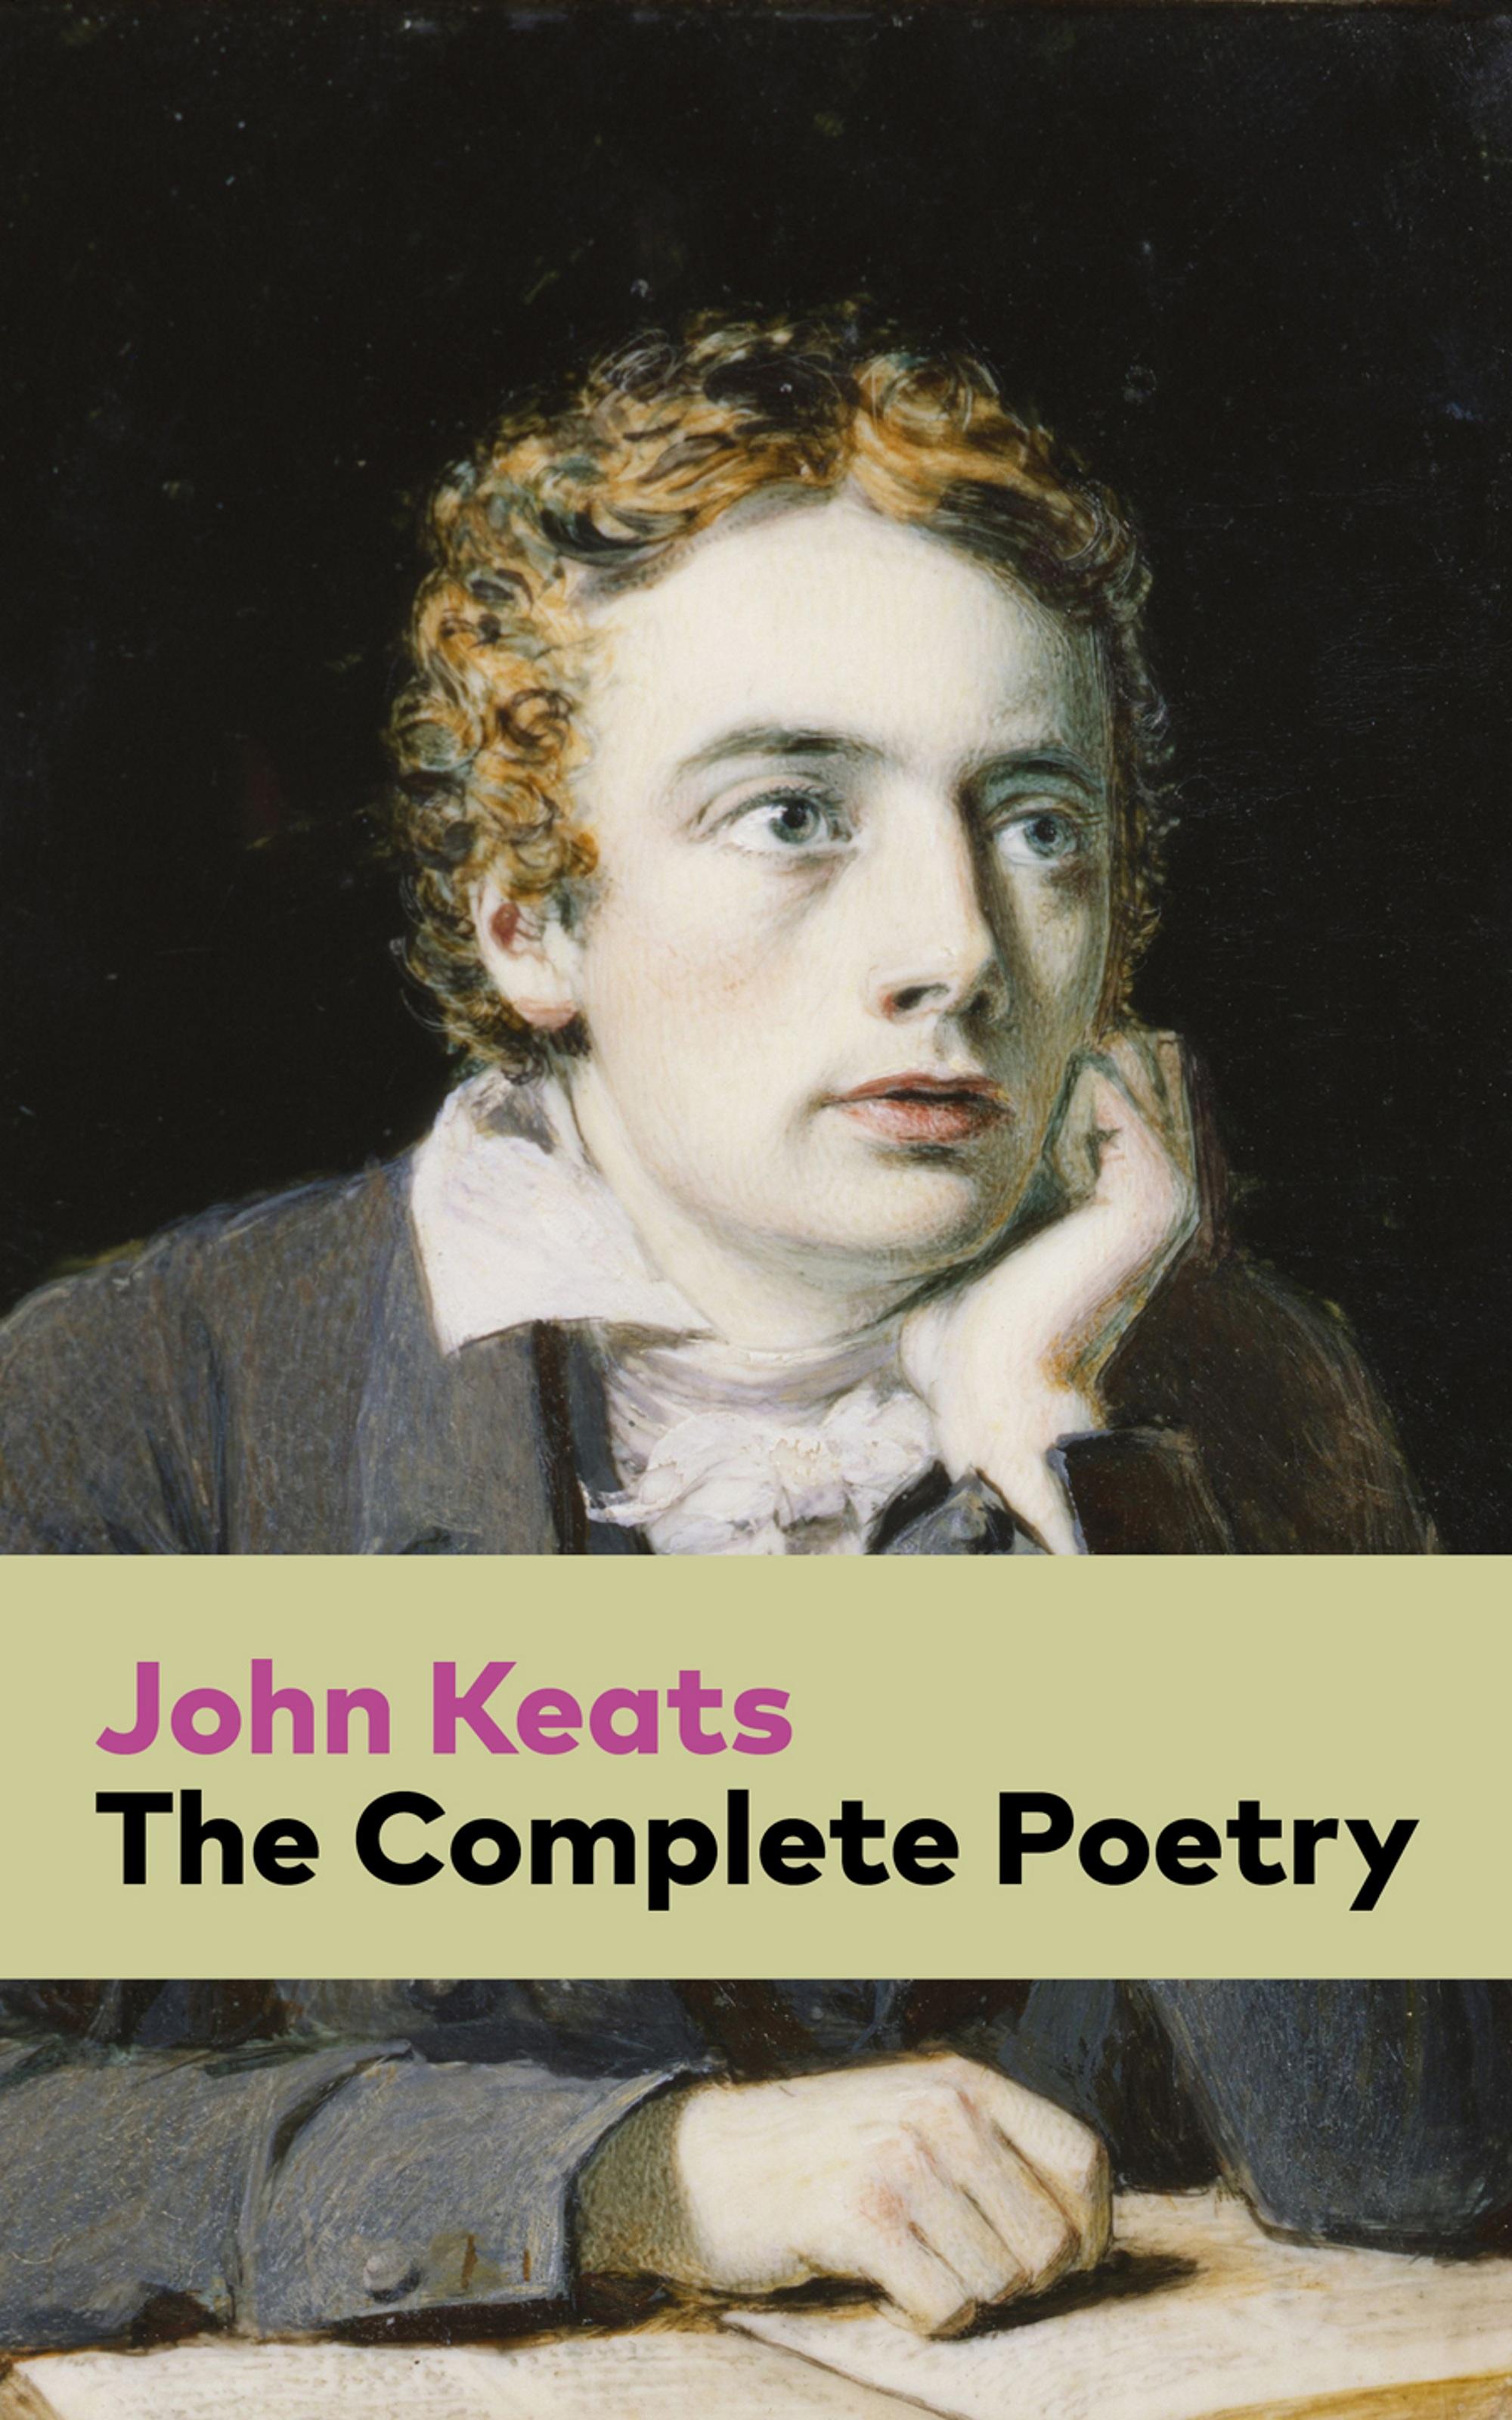 John Keats The Complete Poetry john keats the man behind the lyrics life letters and literary remains of john keats